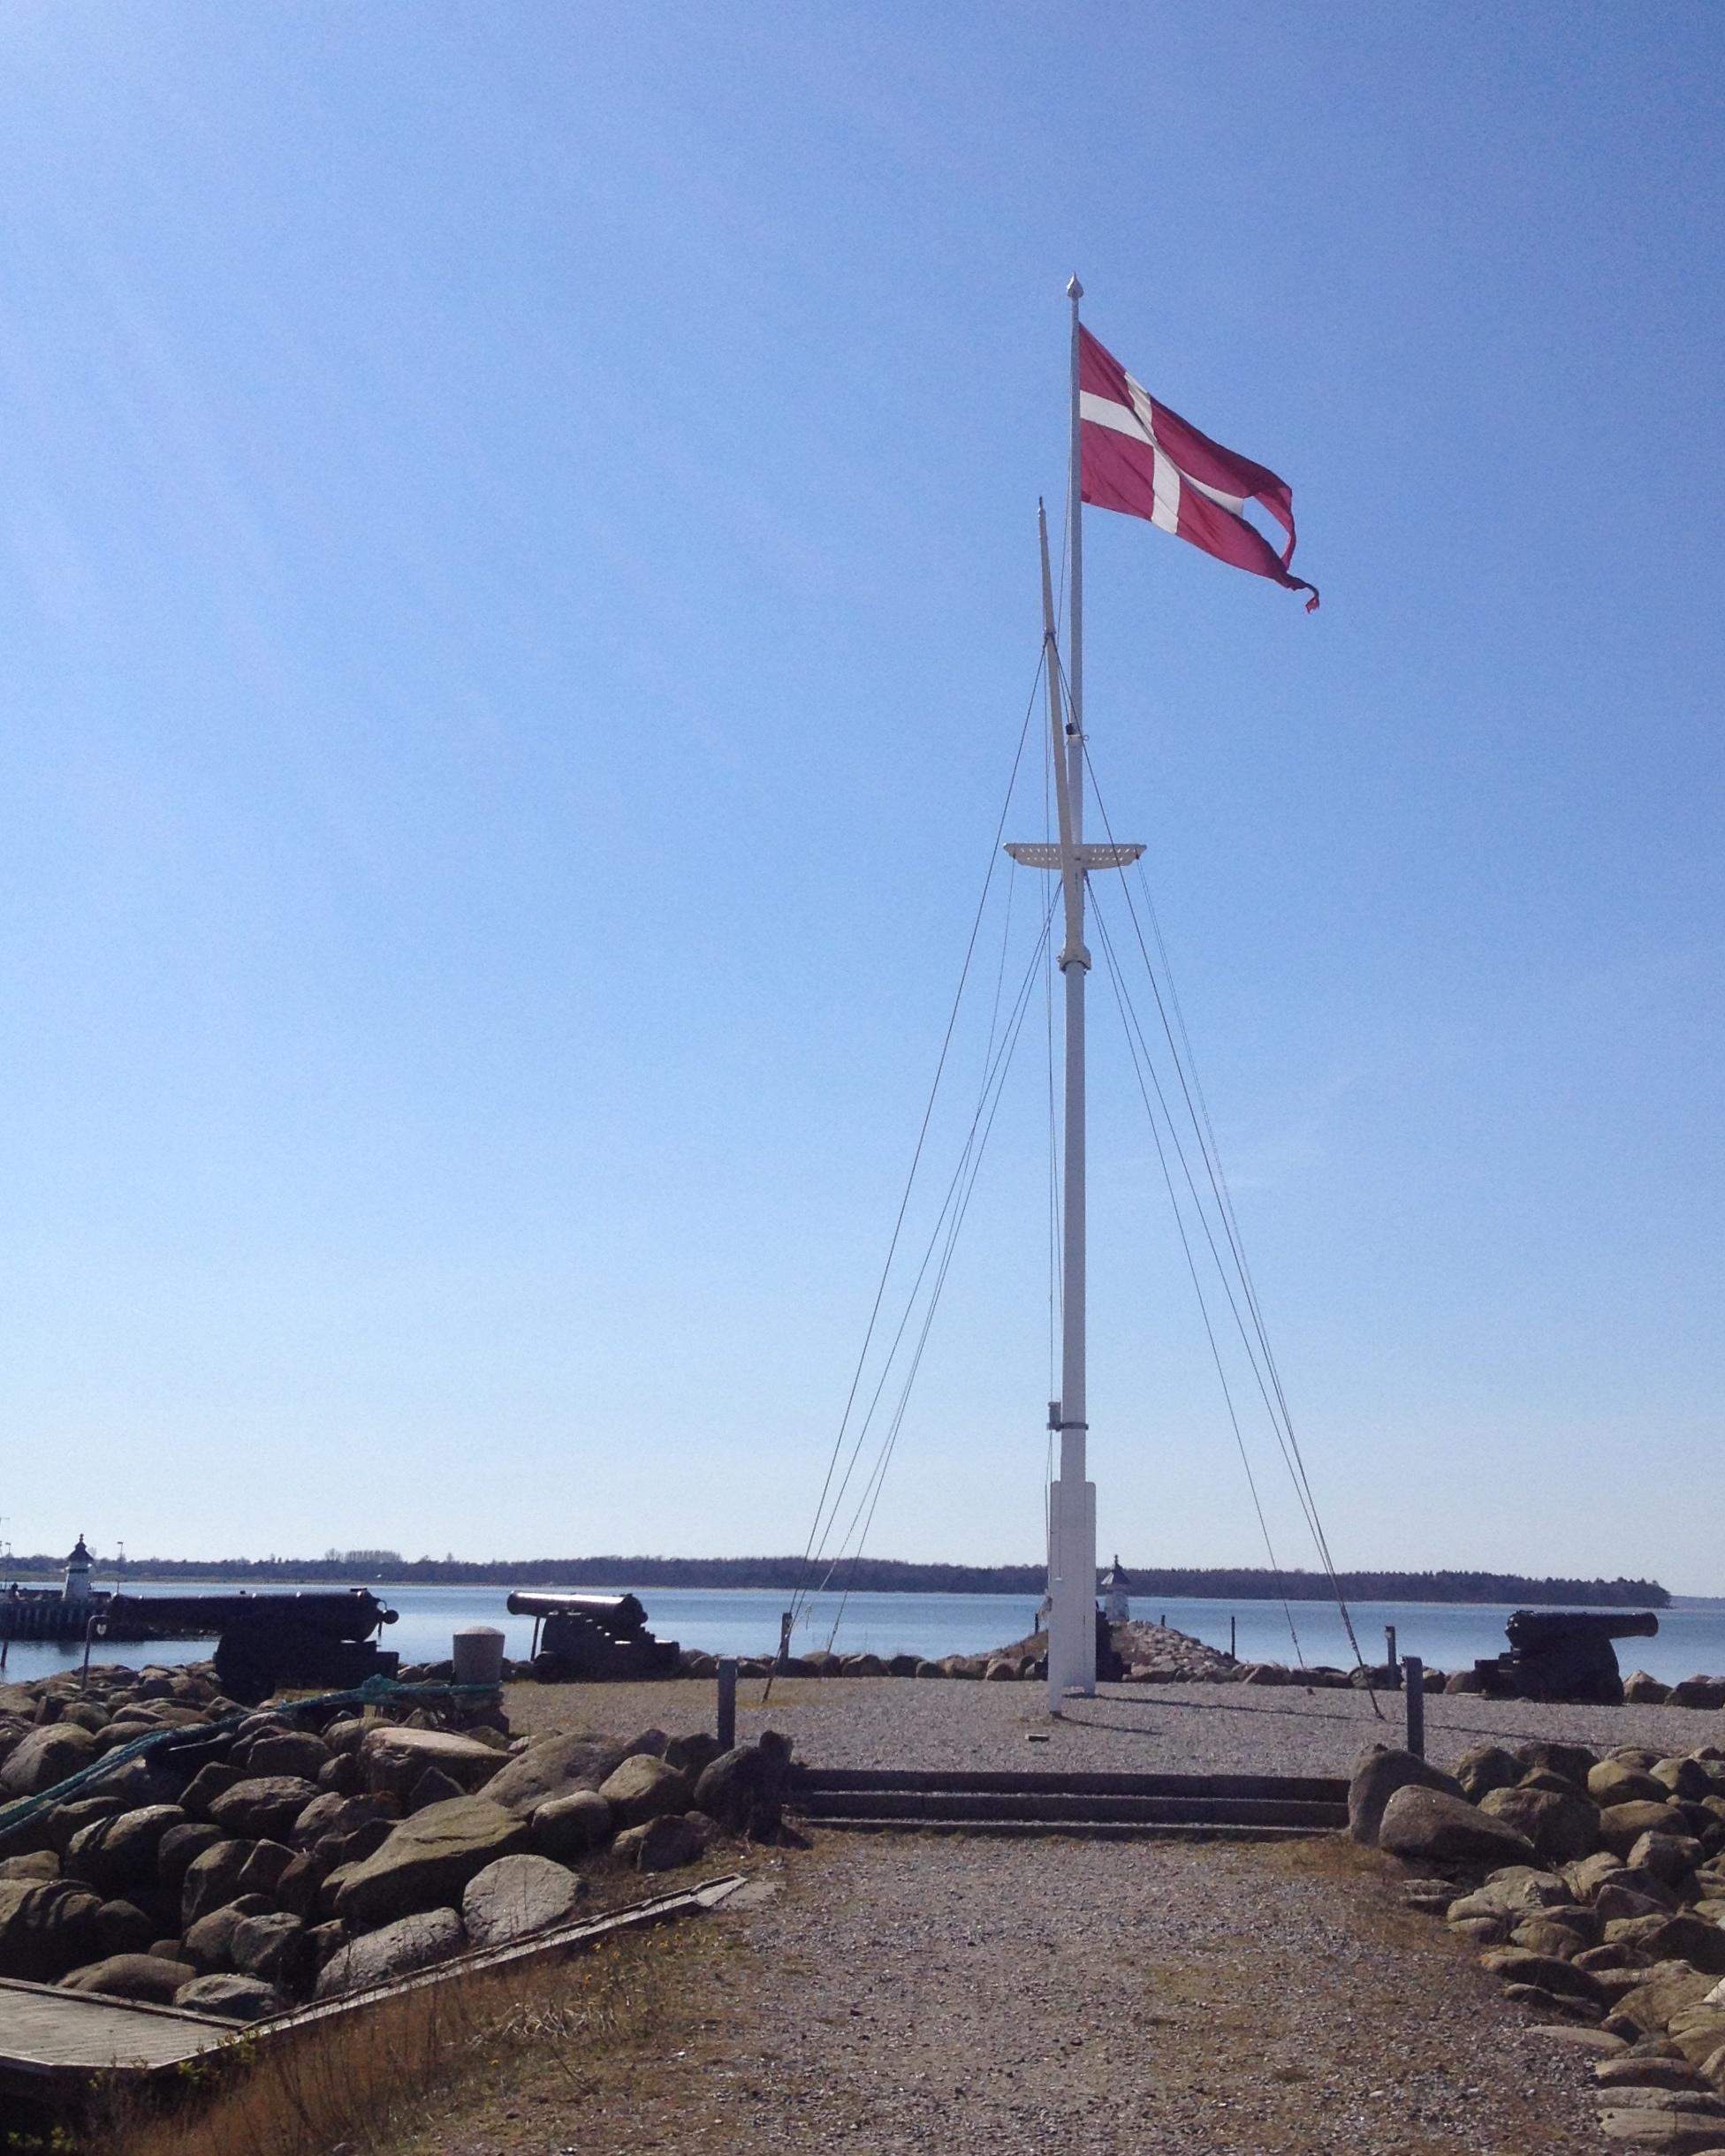 Denmark, April 2015